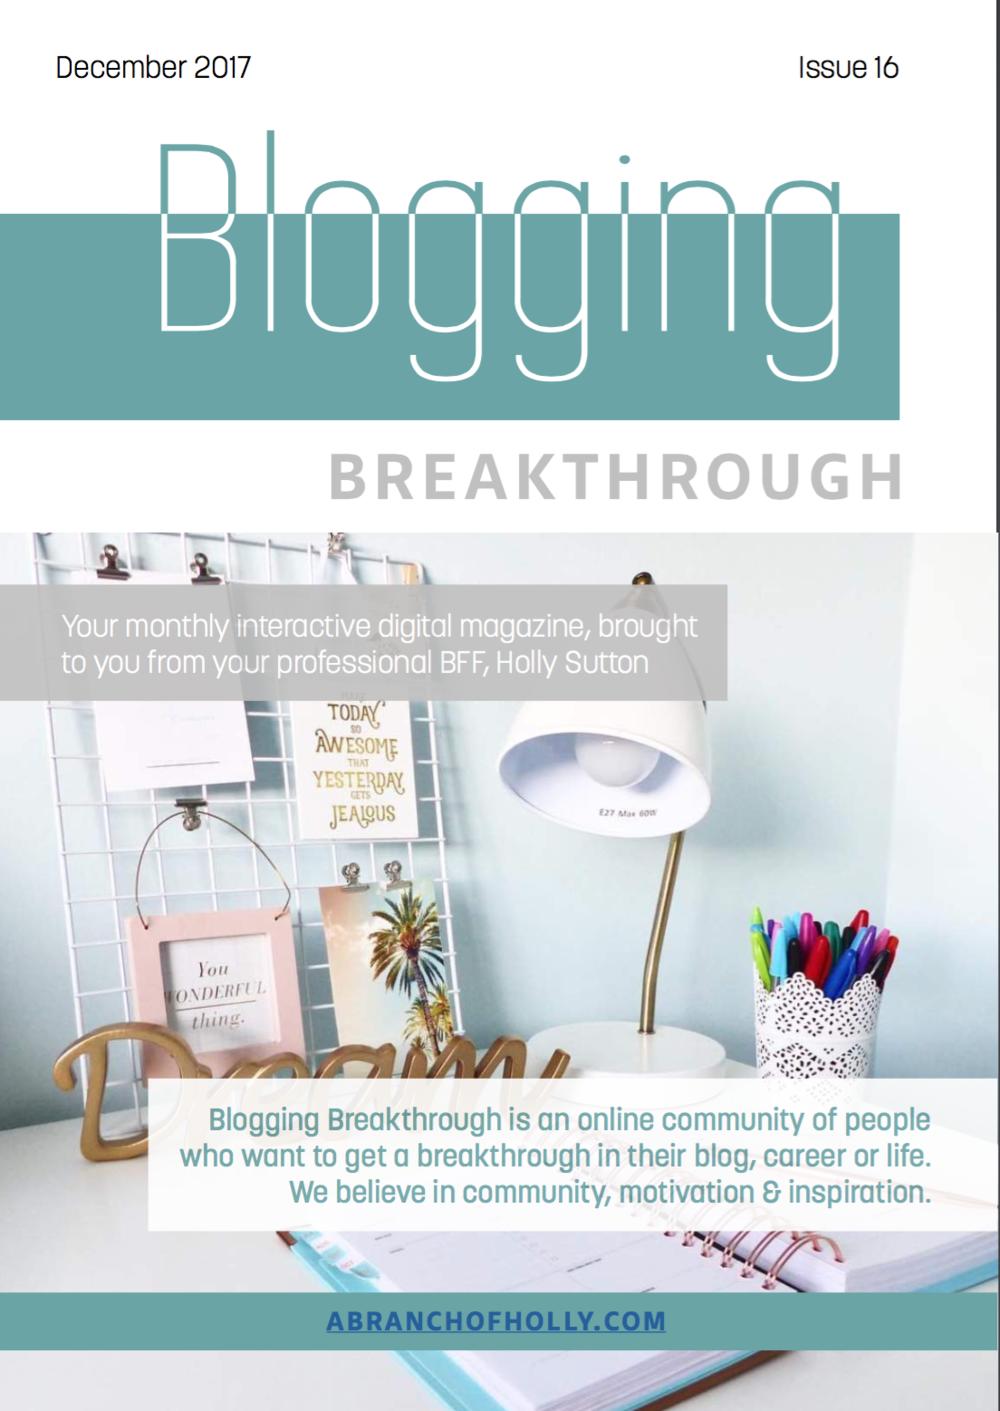 blogging breakthrough december 2018 issue 16